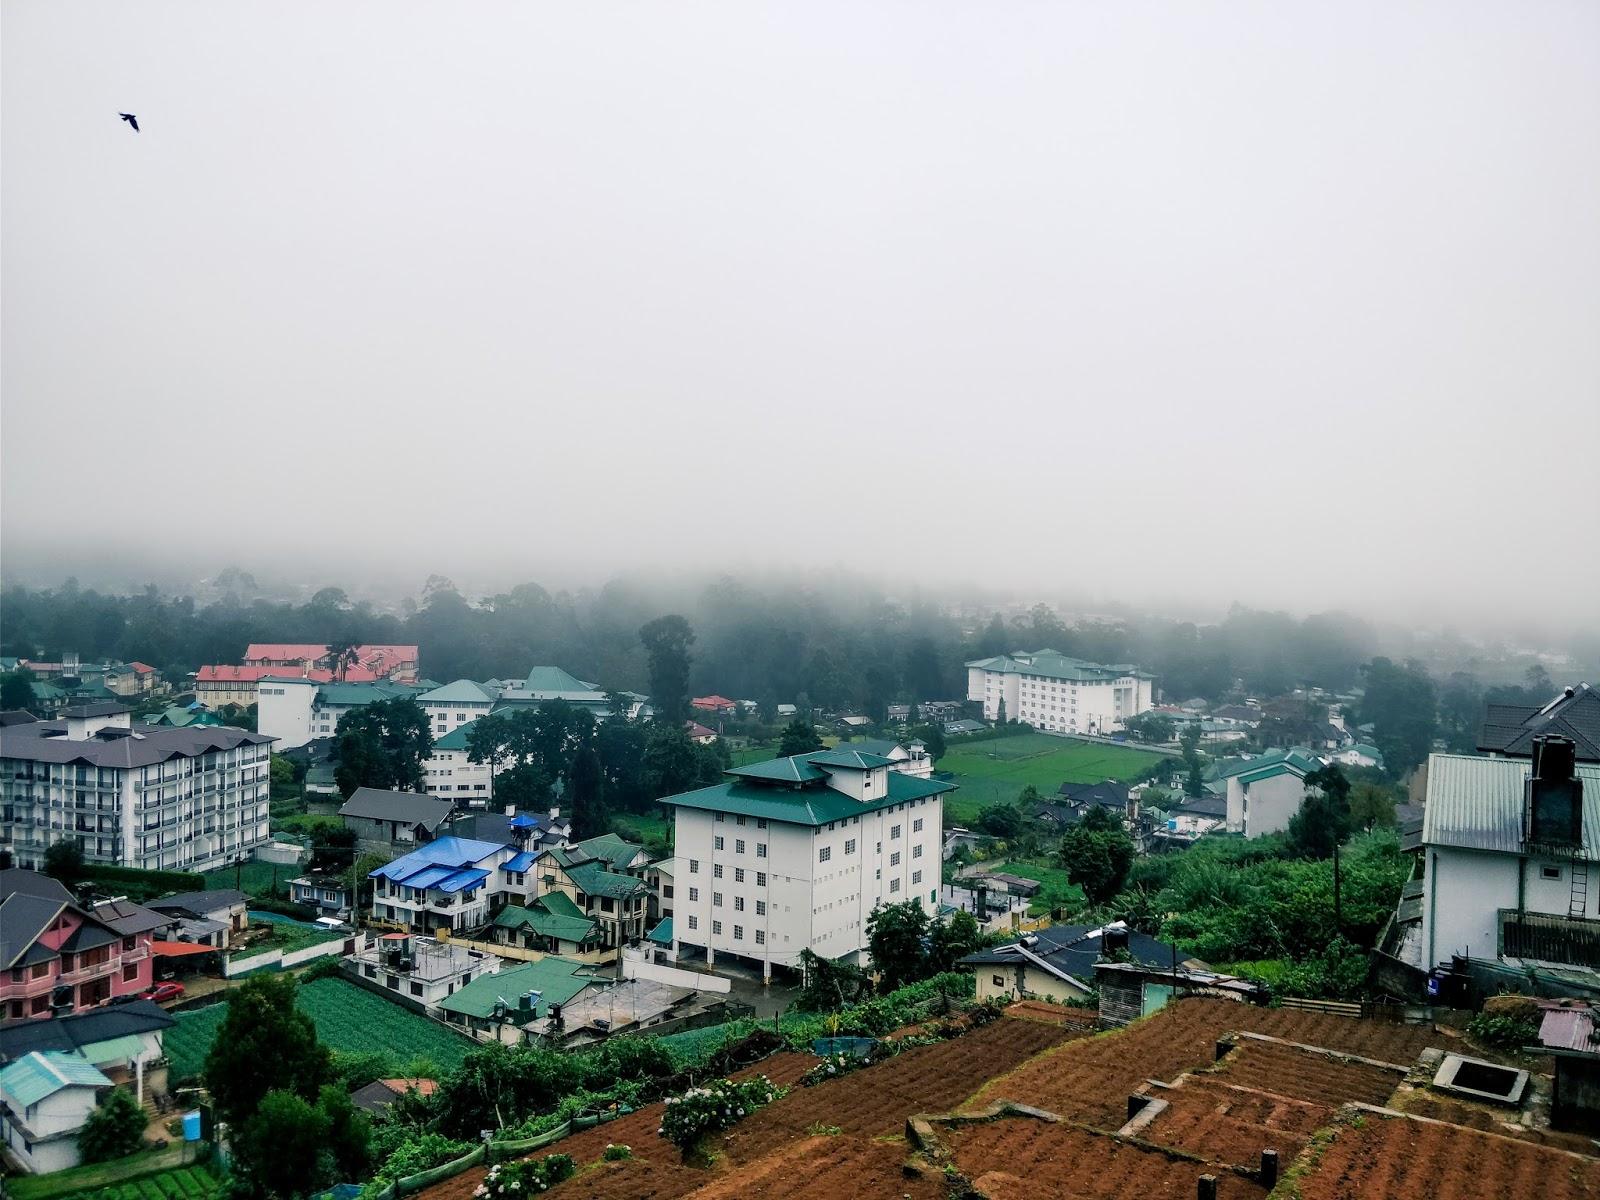 Foggy view from Villa de Roshe in Nuwara Eliya, Sri Lanka